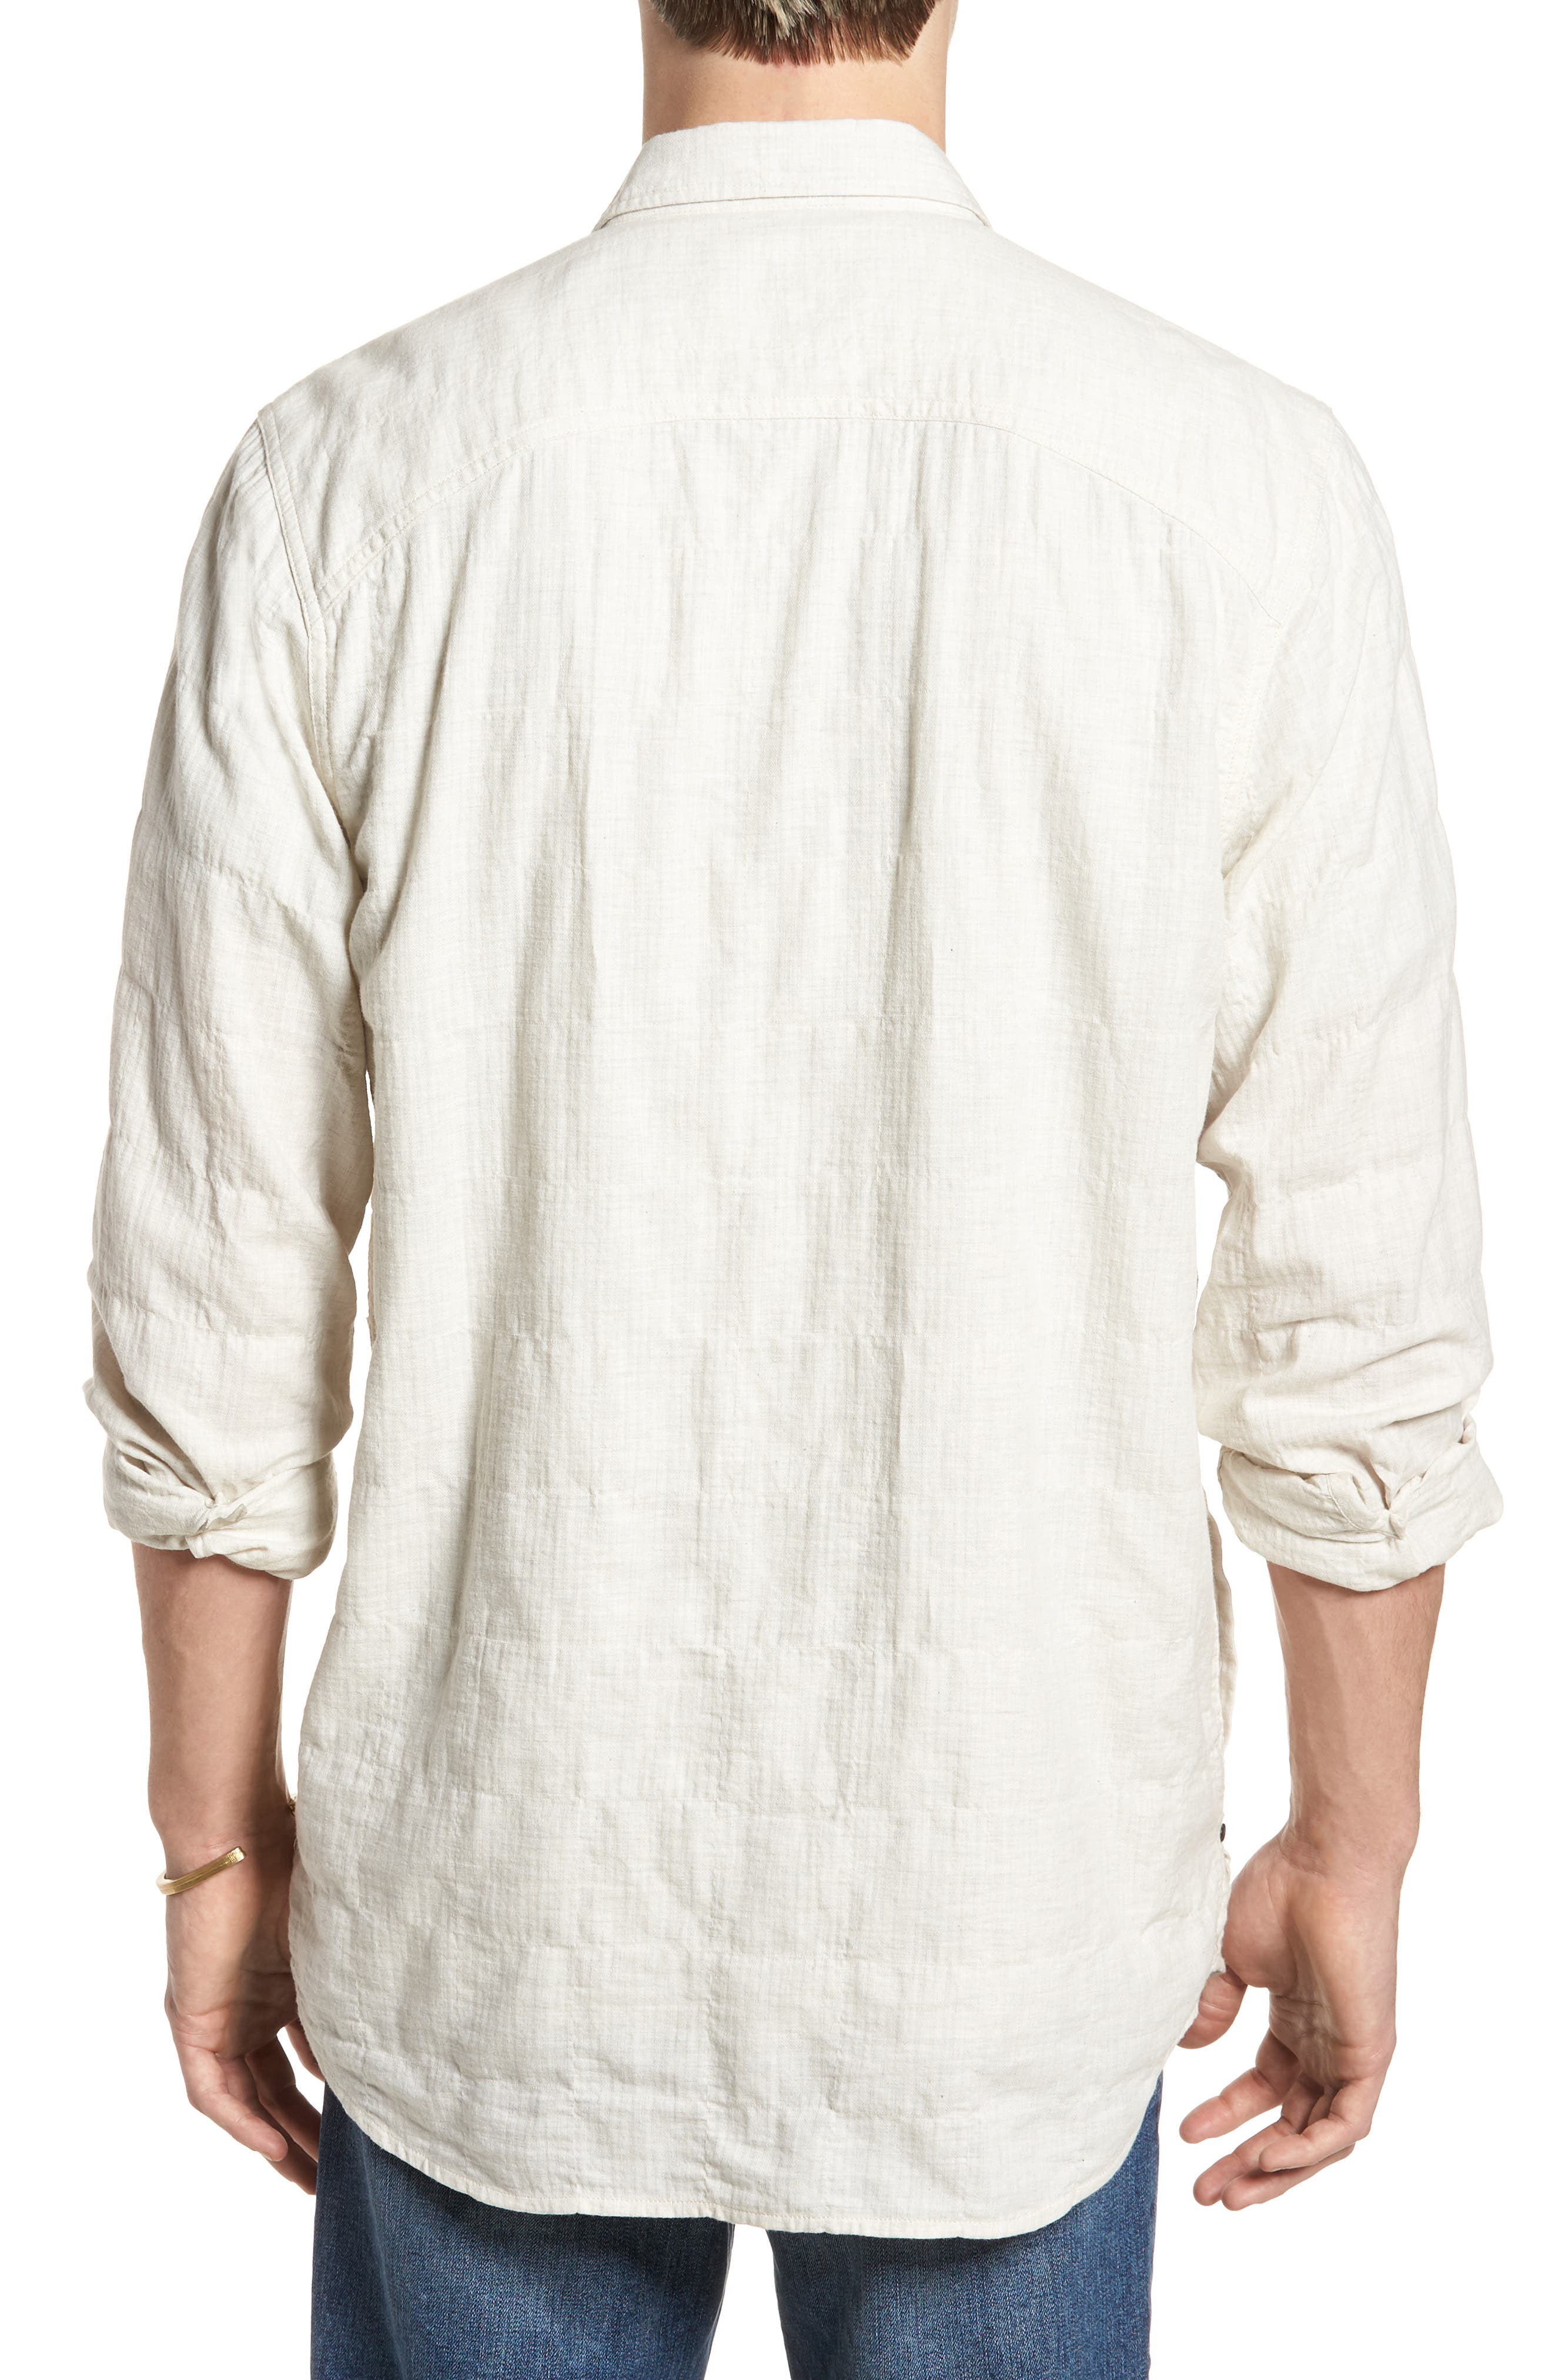 Herringbone Longline Shirt,                             Alternate thumbnail 3, color,                             Ivory Egret Herringbone